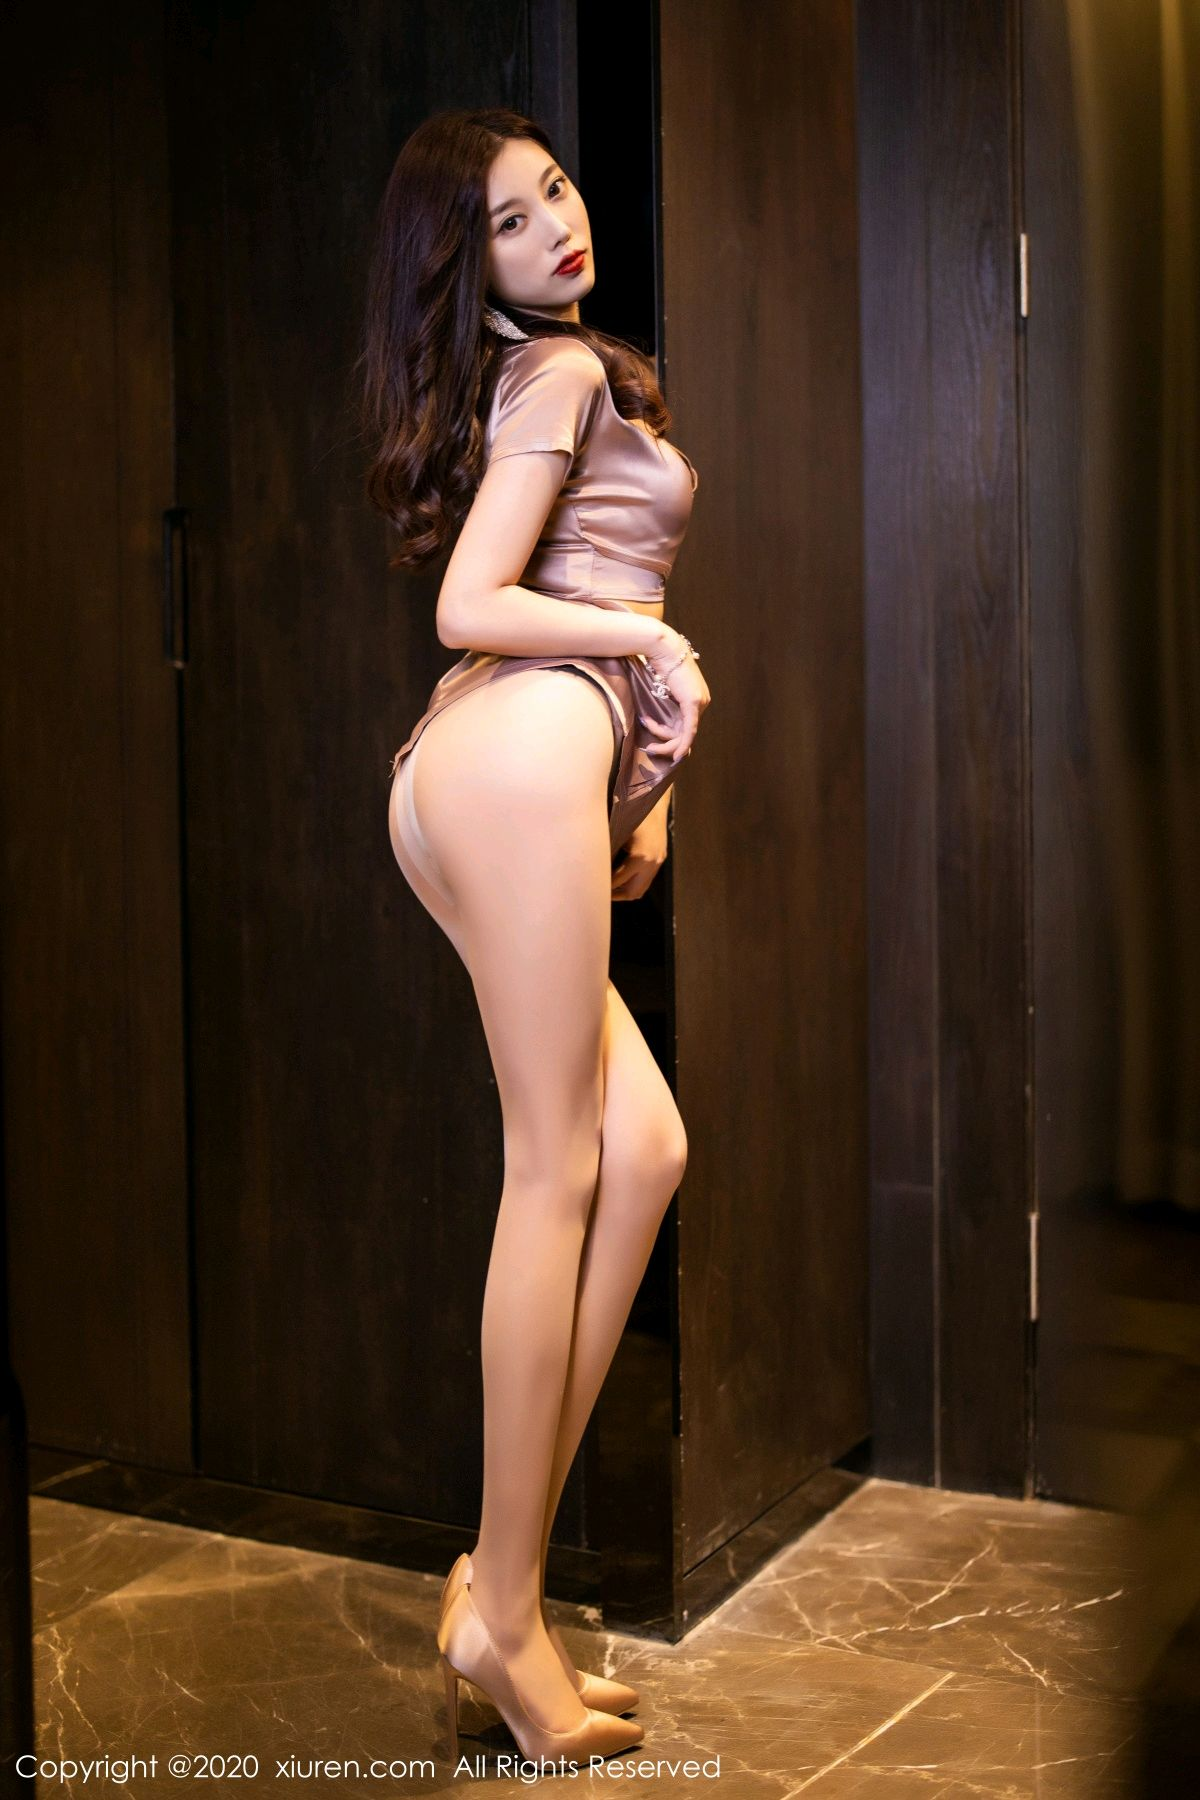 [XiuRen] Vol.2587 Yang Chen Chen 75P, Underwear, Xiuren, Yang Chen Chen